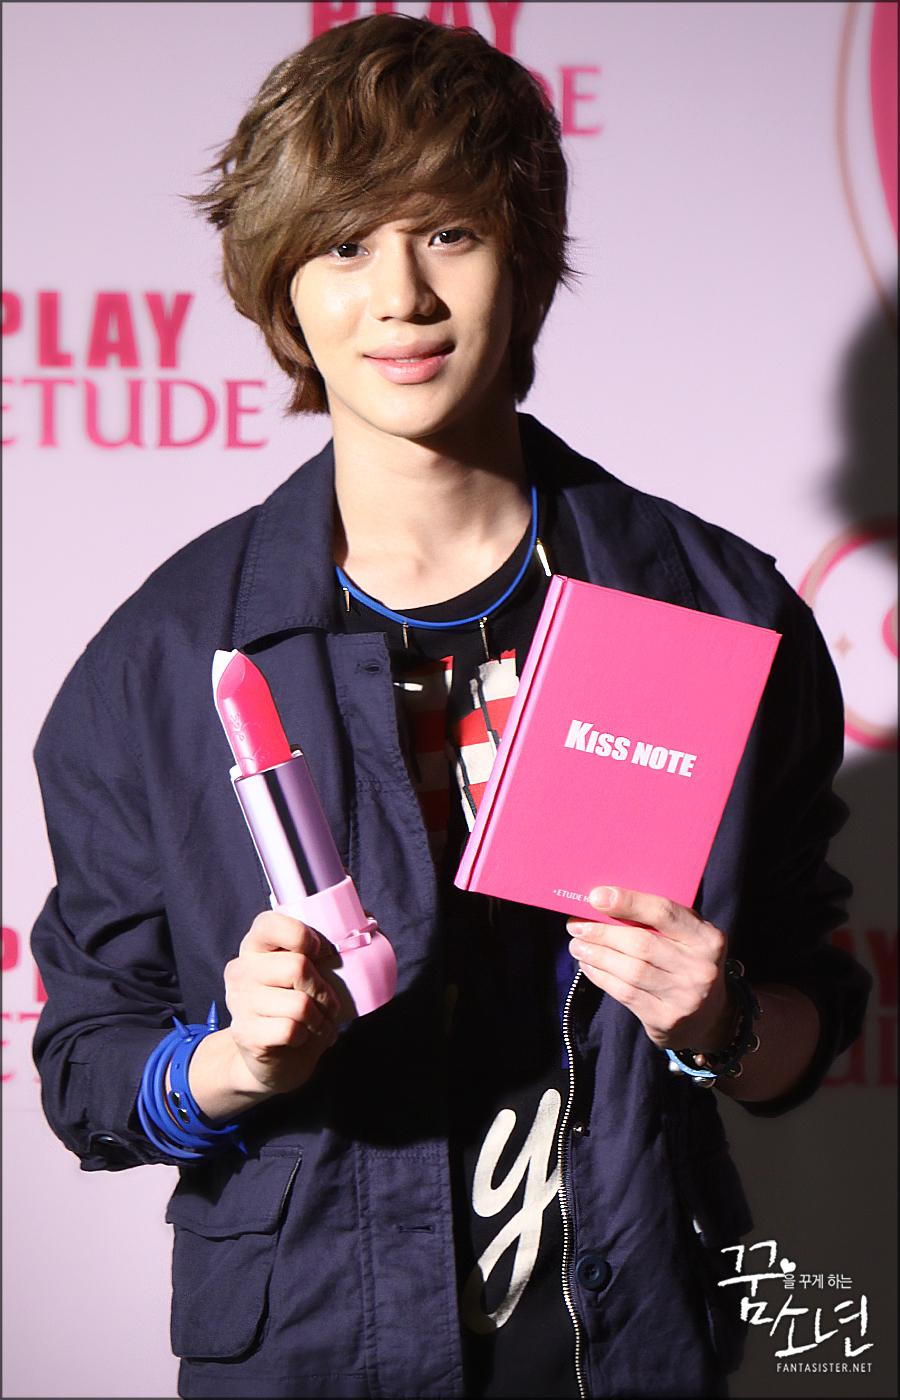 Shinee Jonghyun 2012 ETUDE! KISS NOTE JONGH...